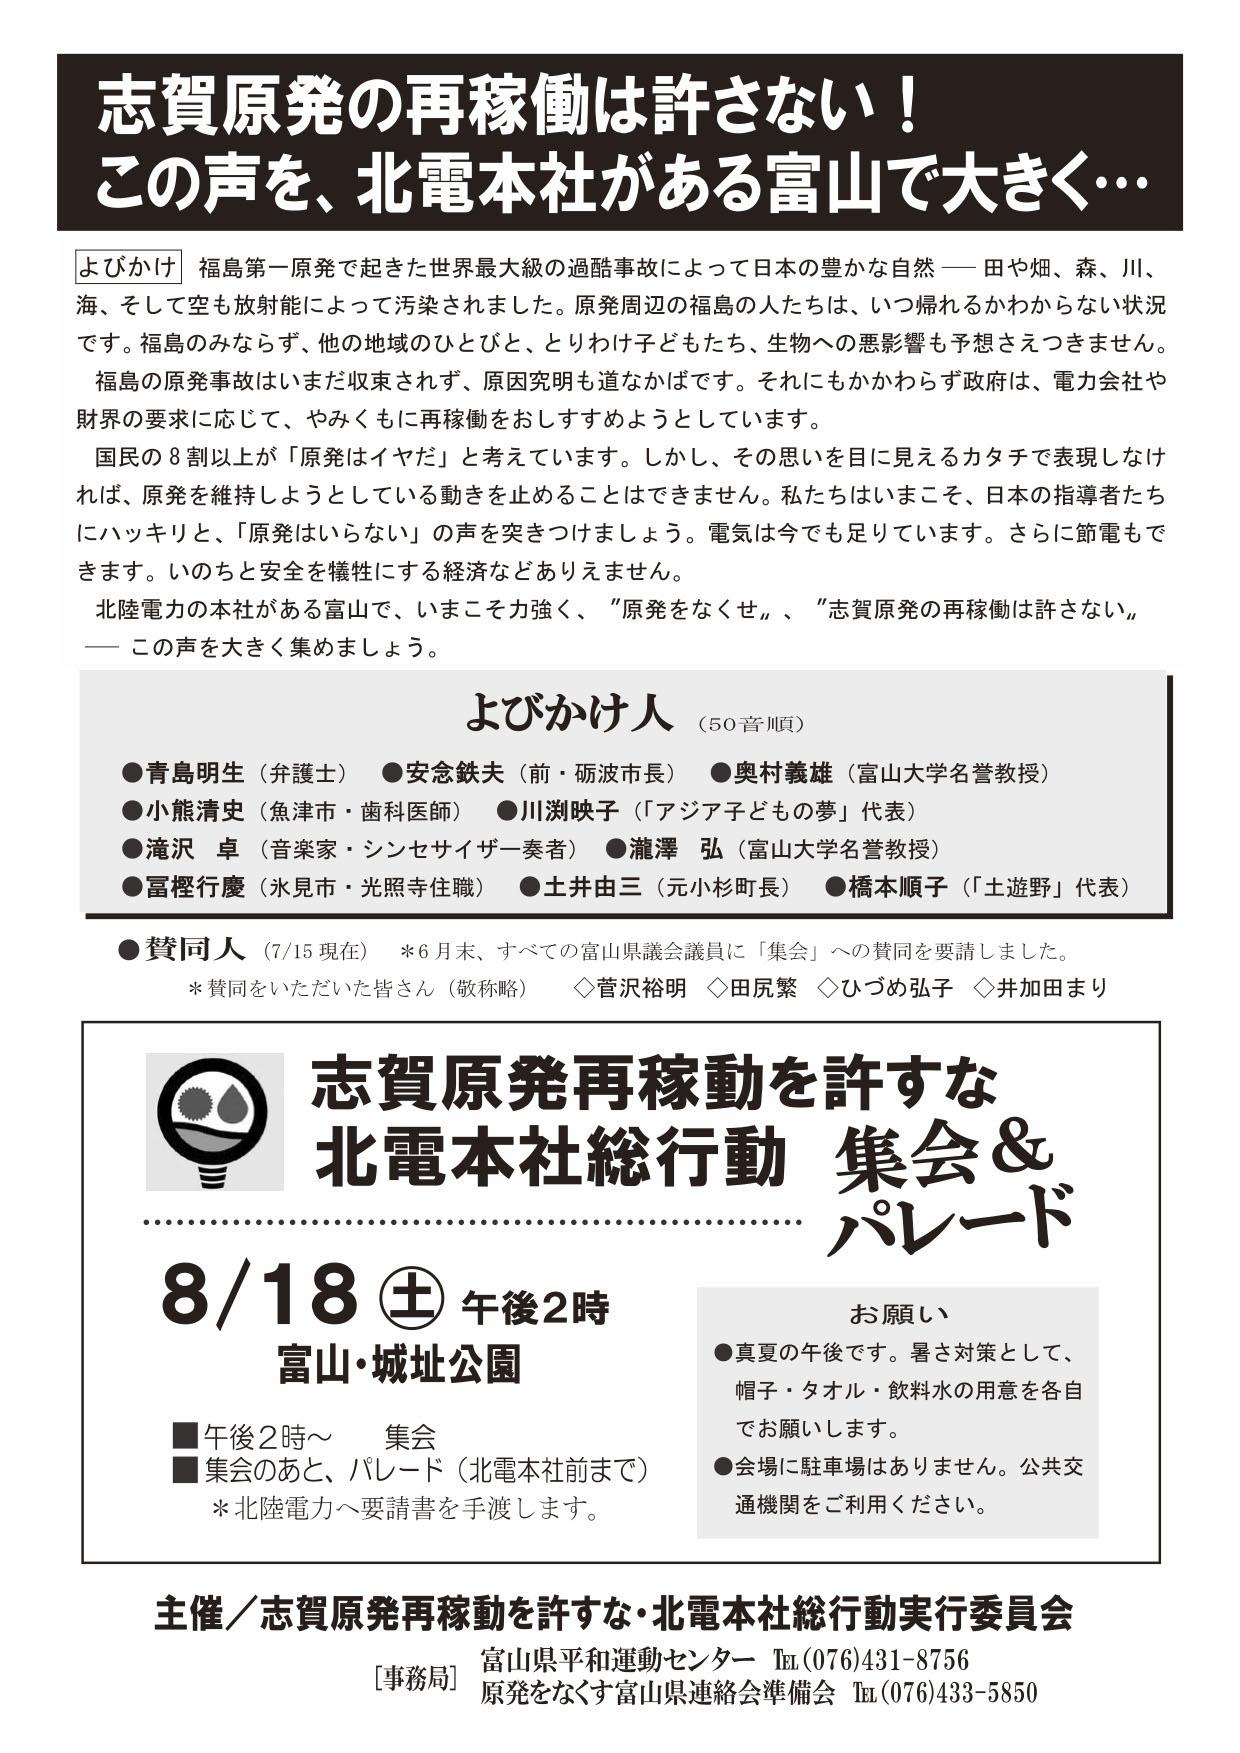 20120818富山原発行動(ビラ裏)kaizolow